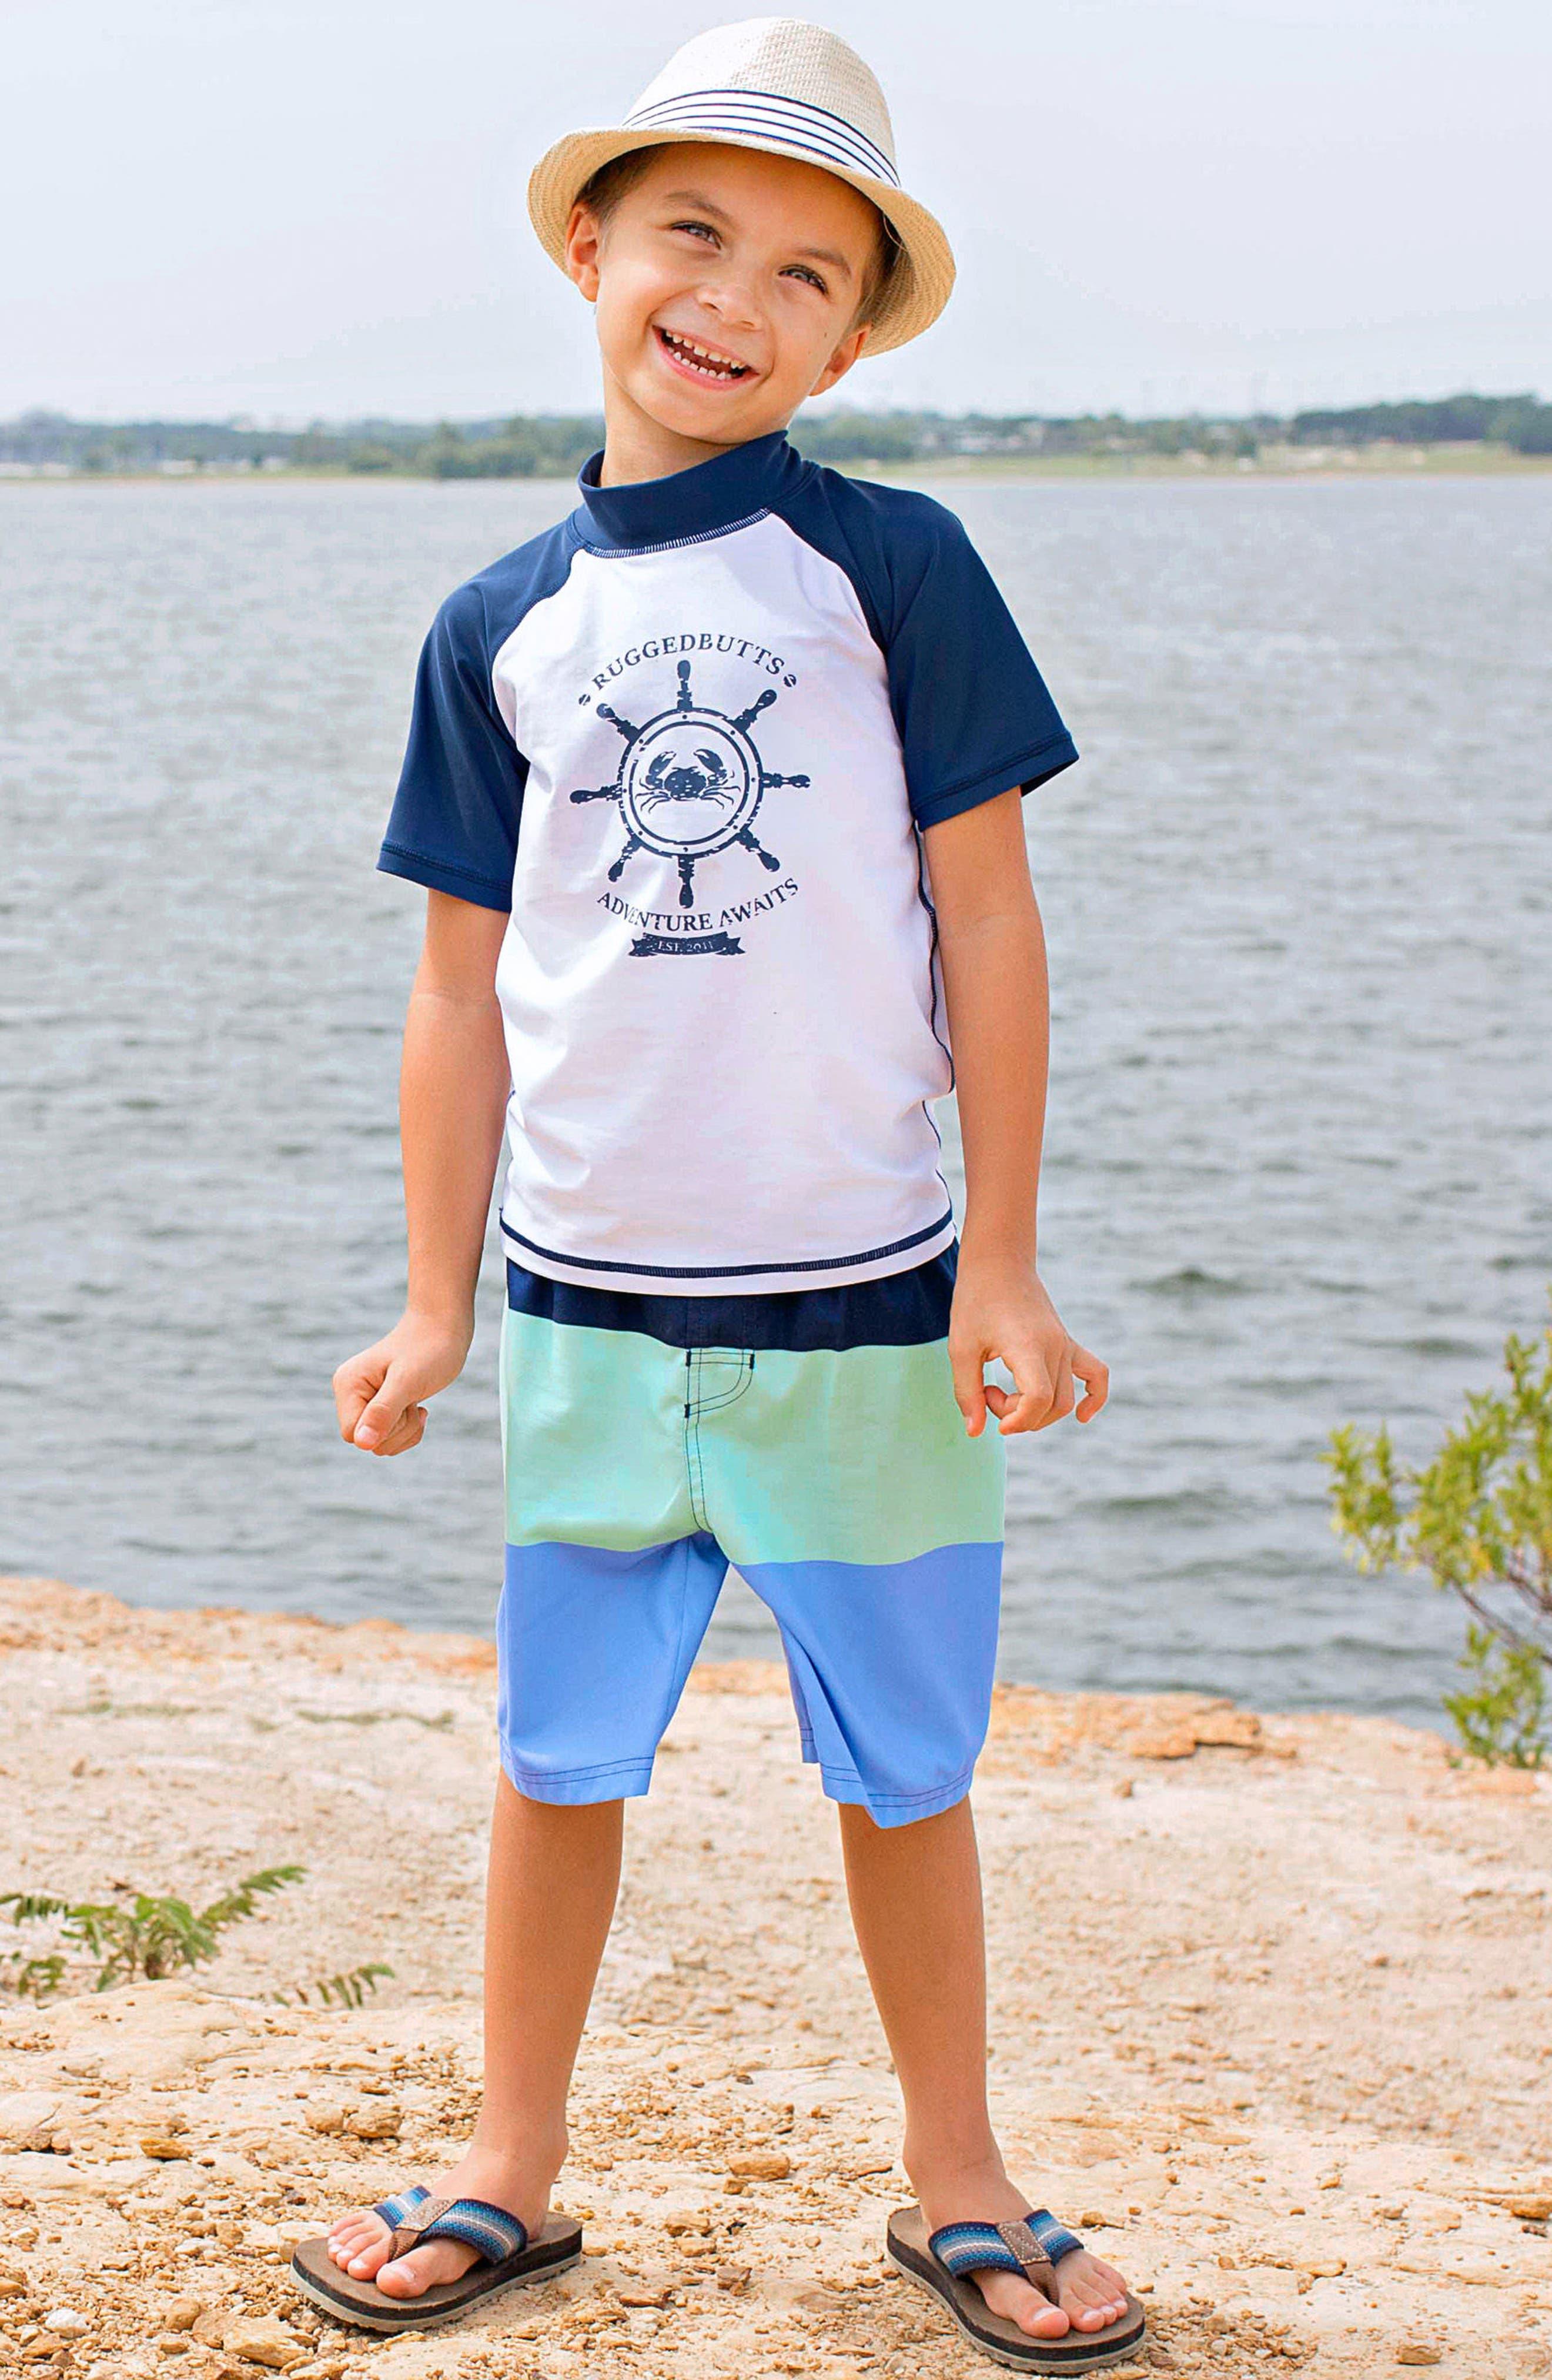 Alternate Image 2  - RuggedButts Adventure Awaits Rashguard & Board Shorts Set (Toddler Boys & Little Boys)